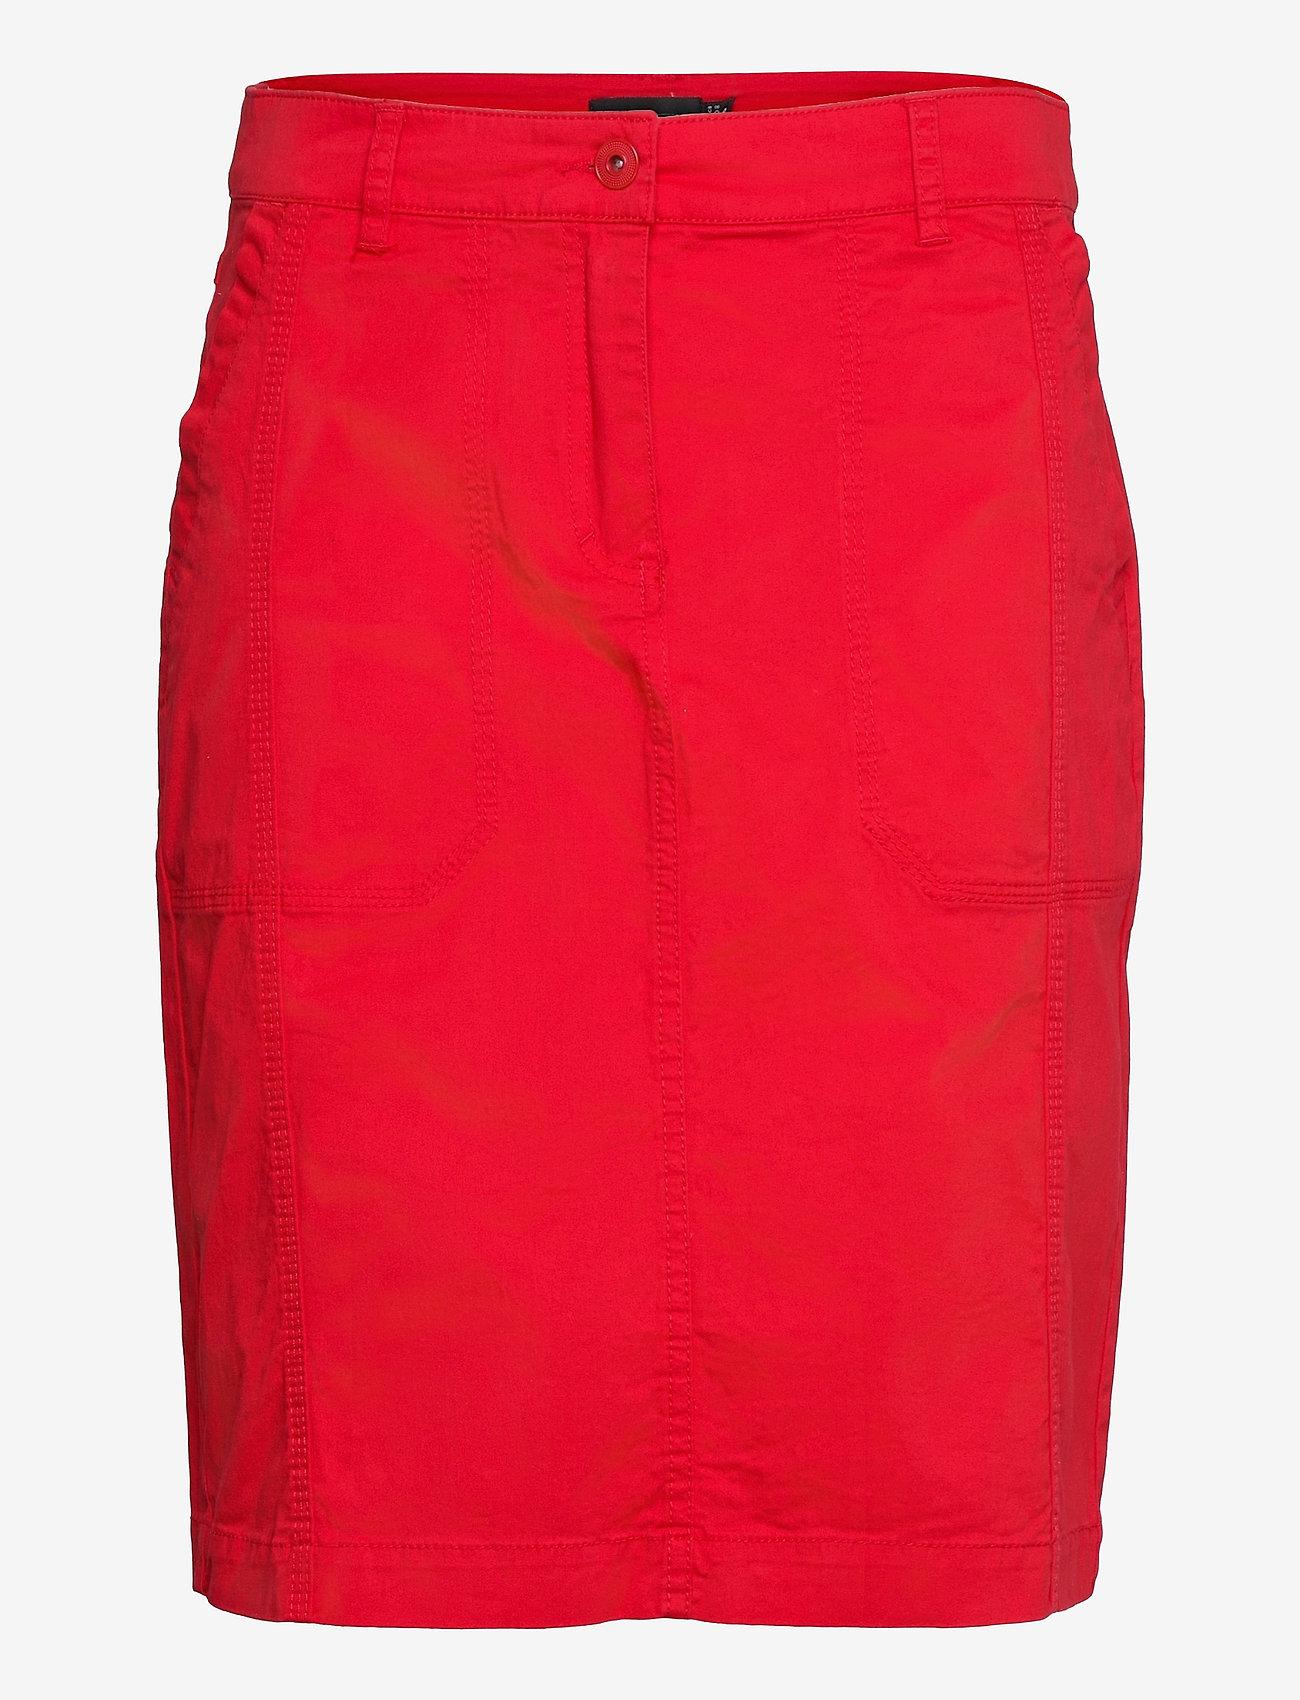 Brandtex - Casual skirt - midinederdele - racing red - 1